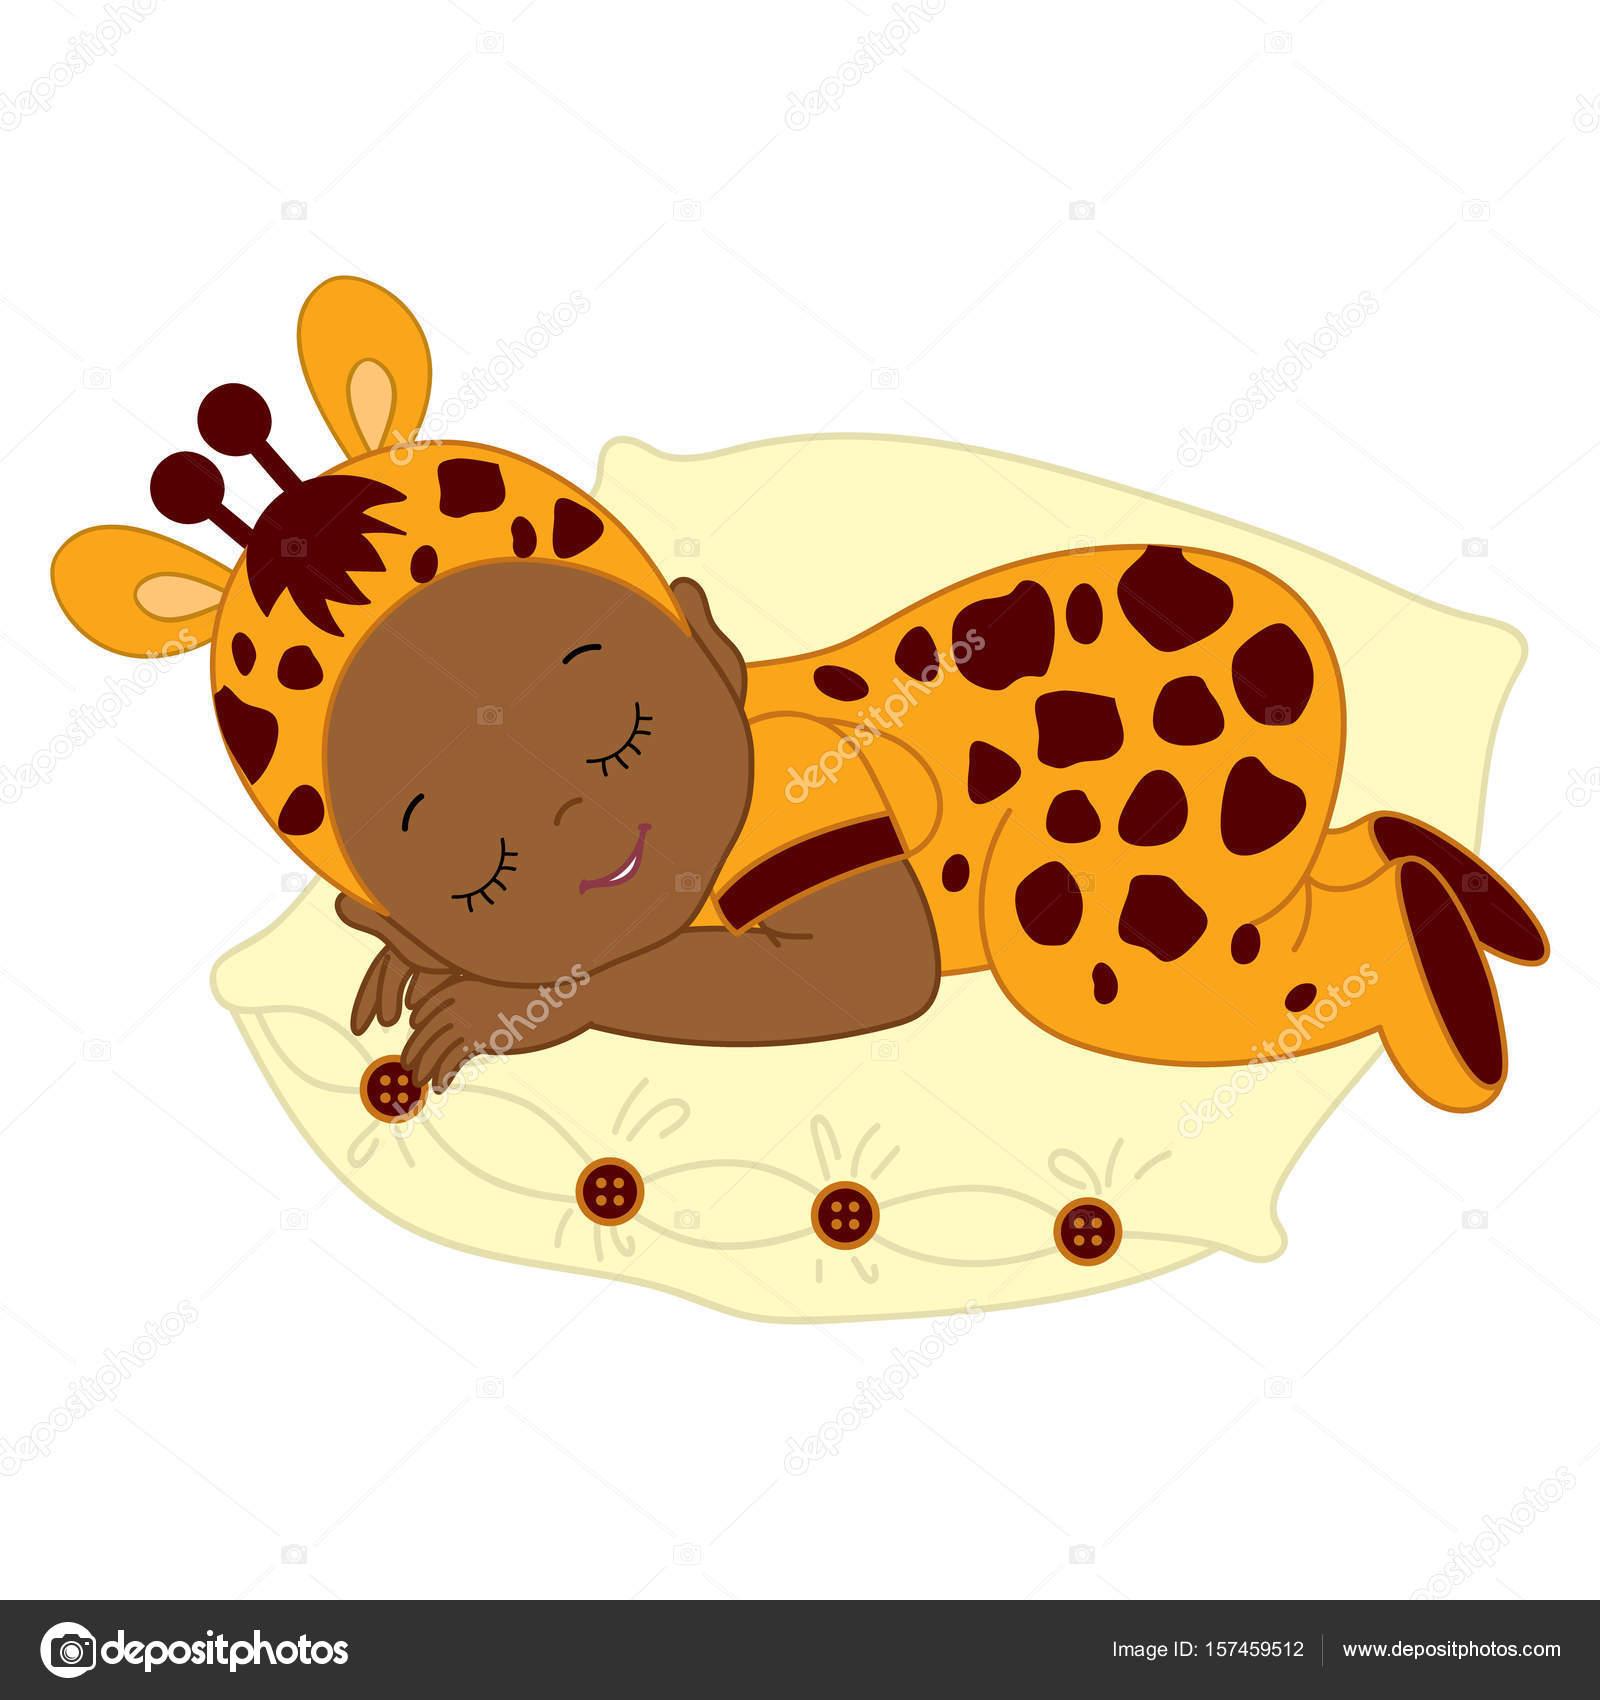 Vector African American Cute Baby in Giraffe Costume Sleeping. u2014 Stock Vector  sc 1 st  Depositphotos & Vector African American Cute Baby in Giraffe Costume Sleeping ...